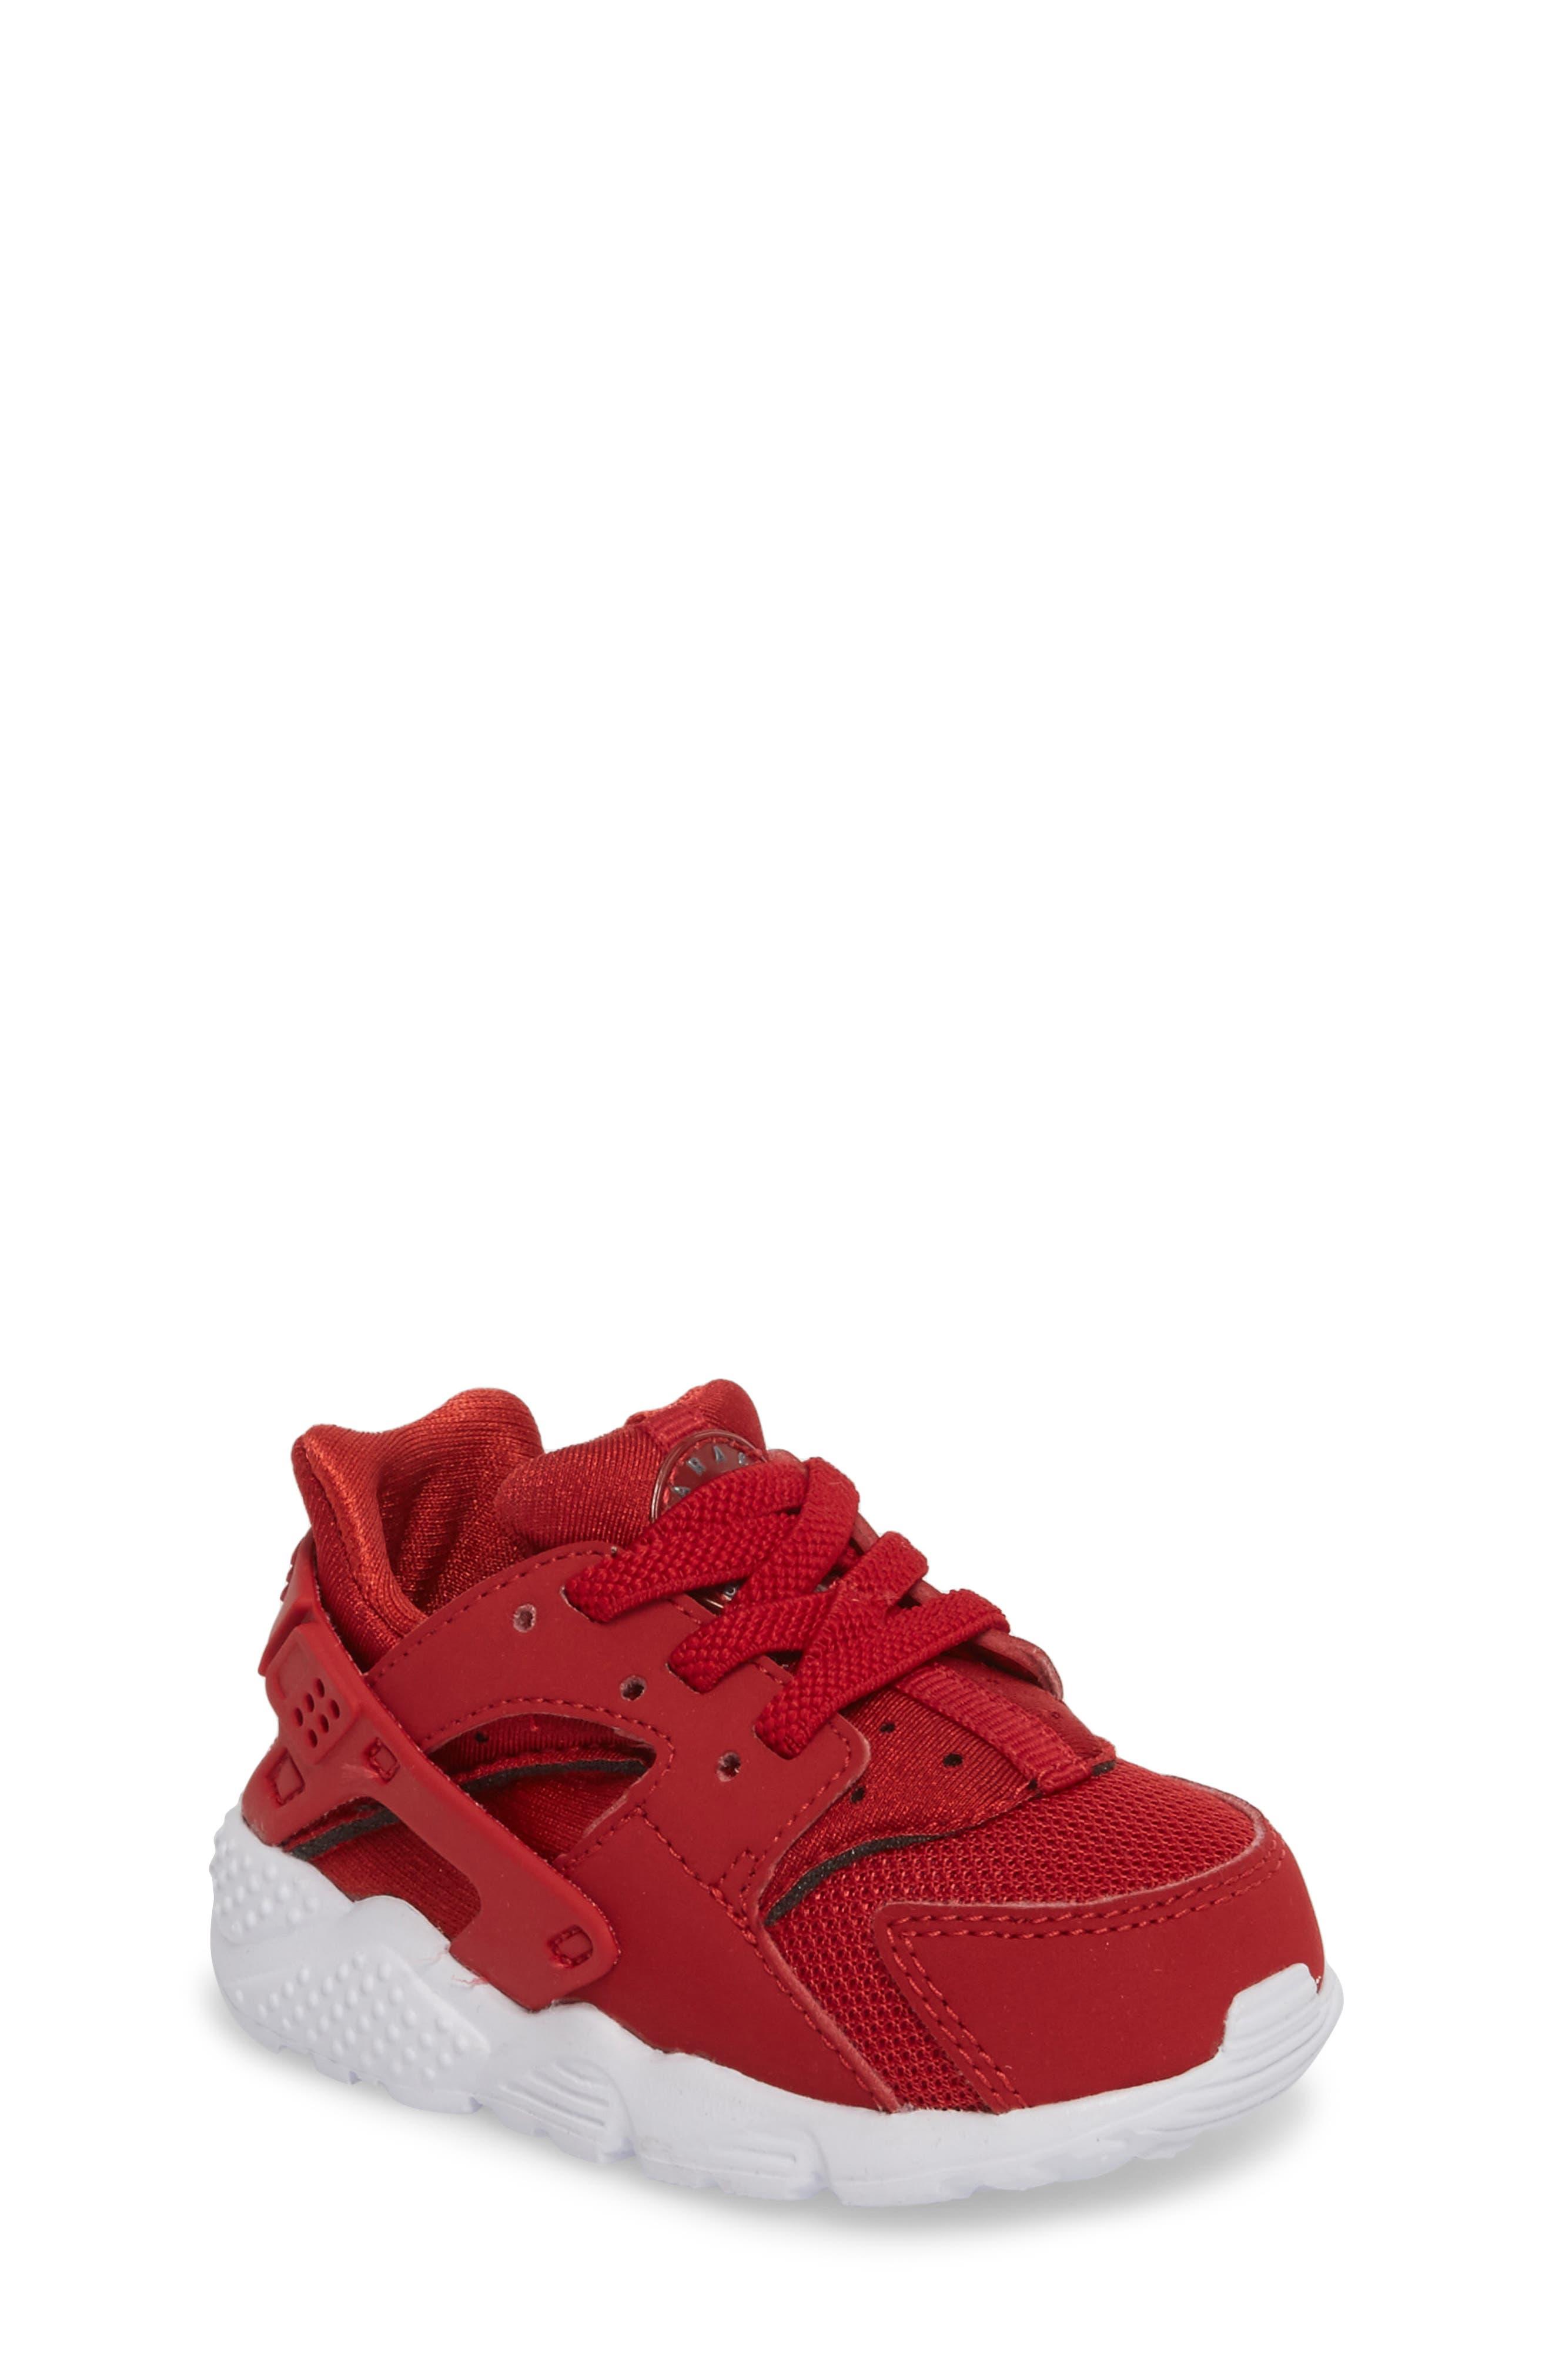 'Huarache Run' Sneaker,                             Main thumbnail 1, color,                             Gym Red/ Dark Grey/ White